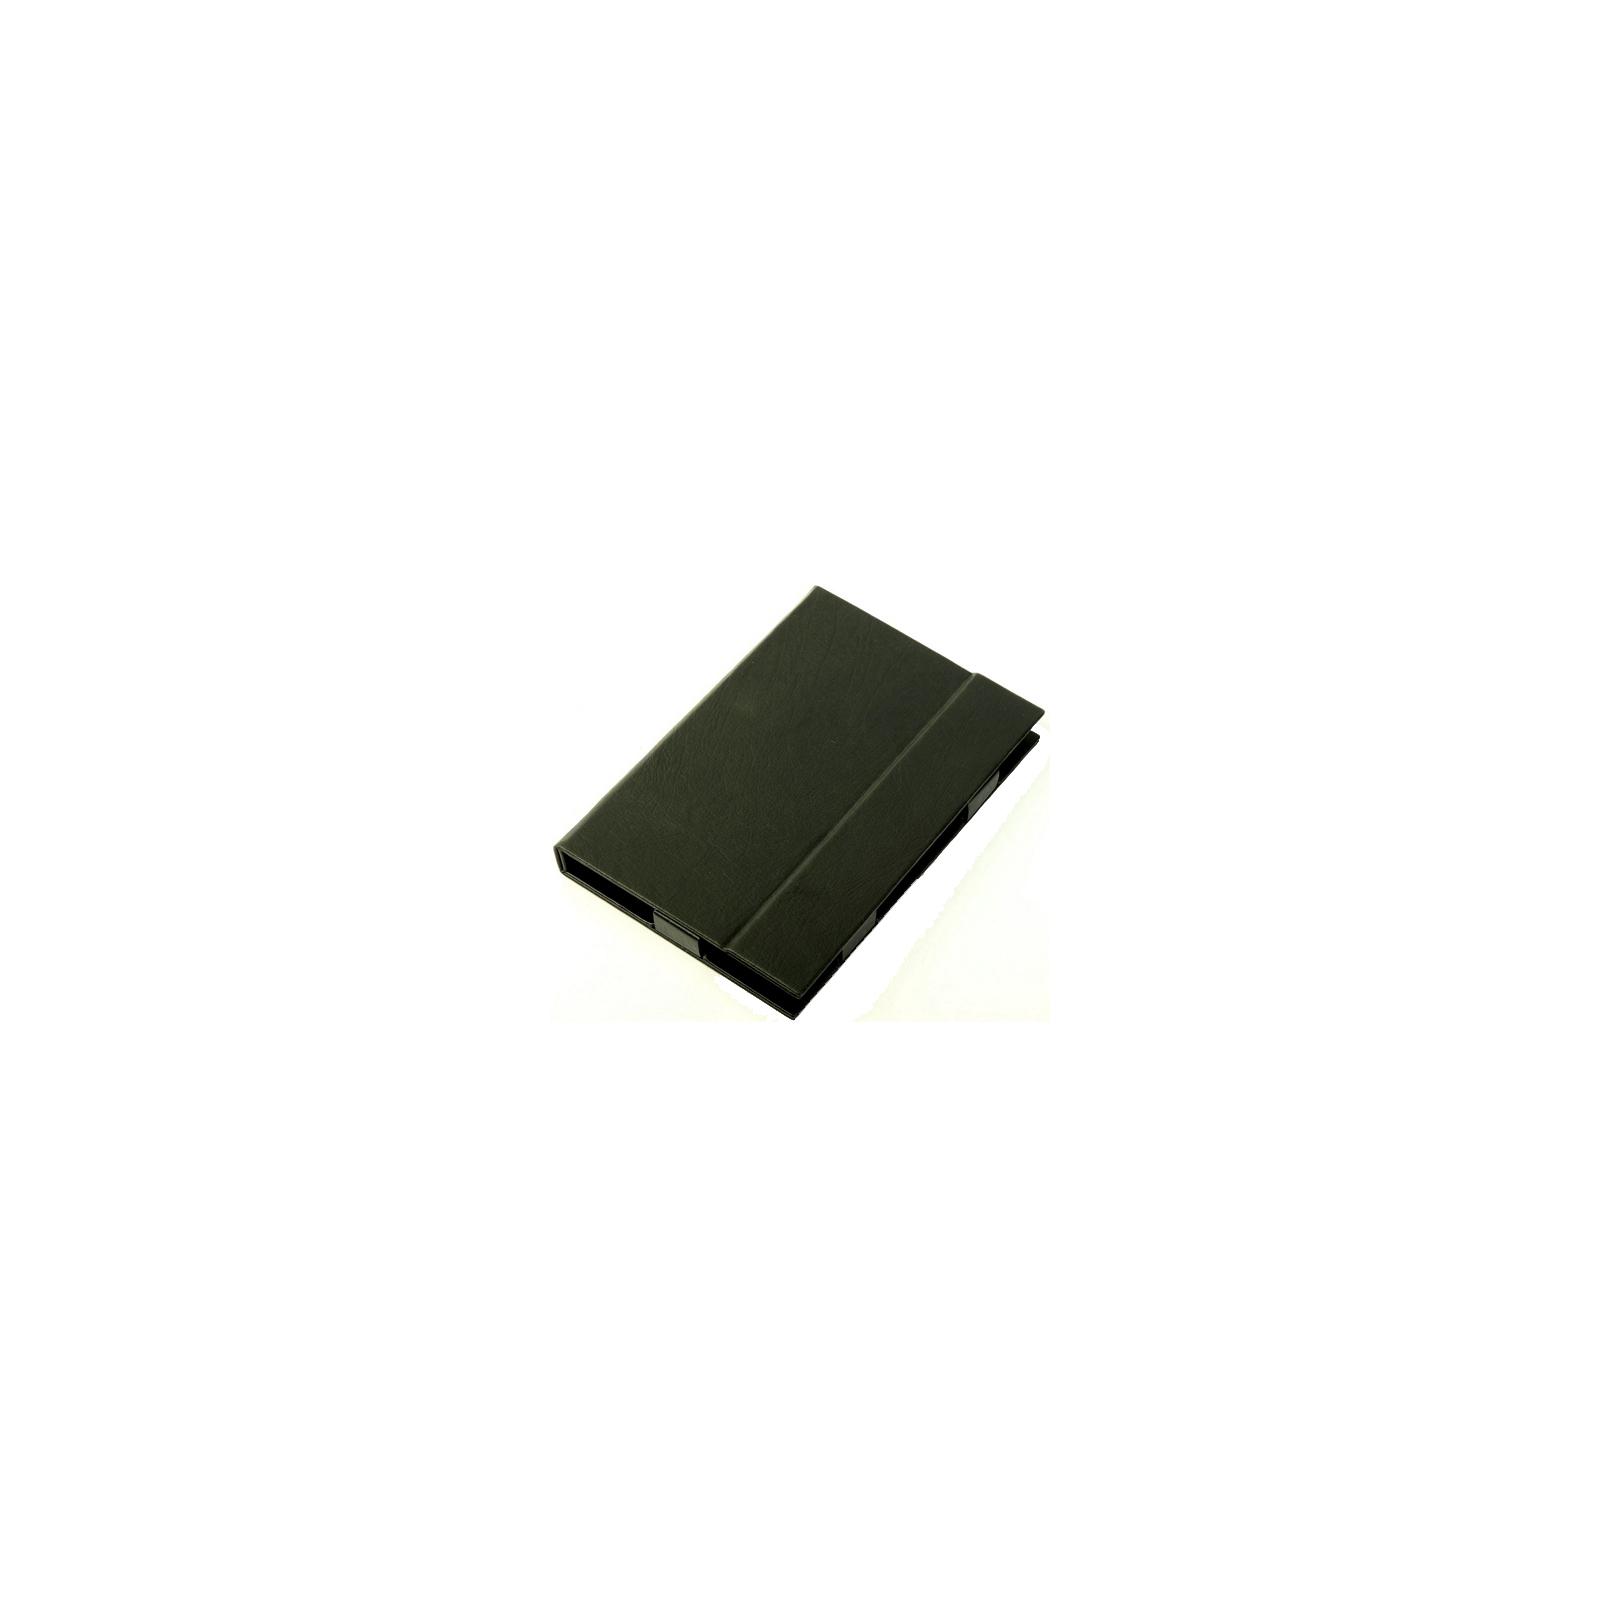 Чехол для планшета Vento 10.1 Desire Matt - black